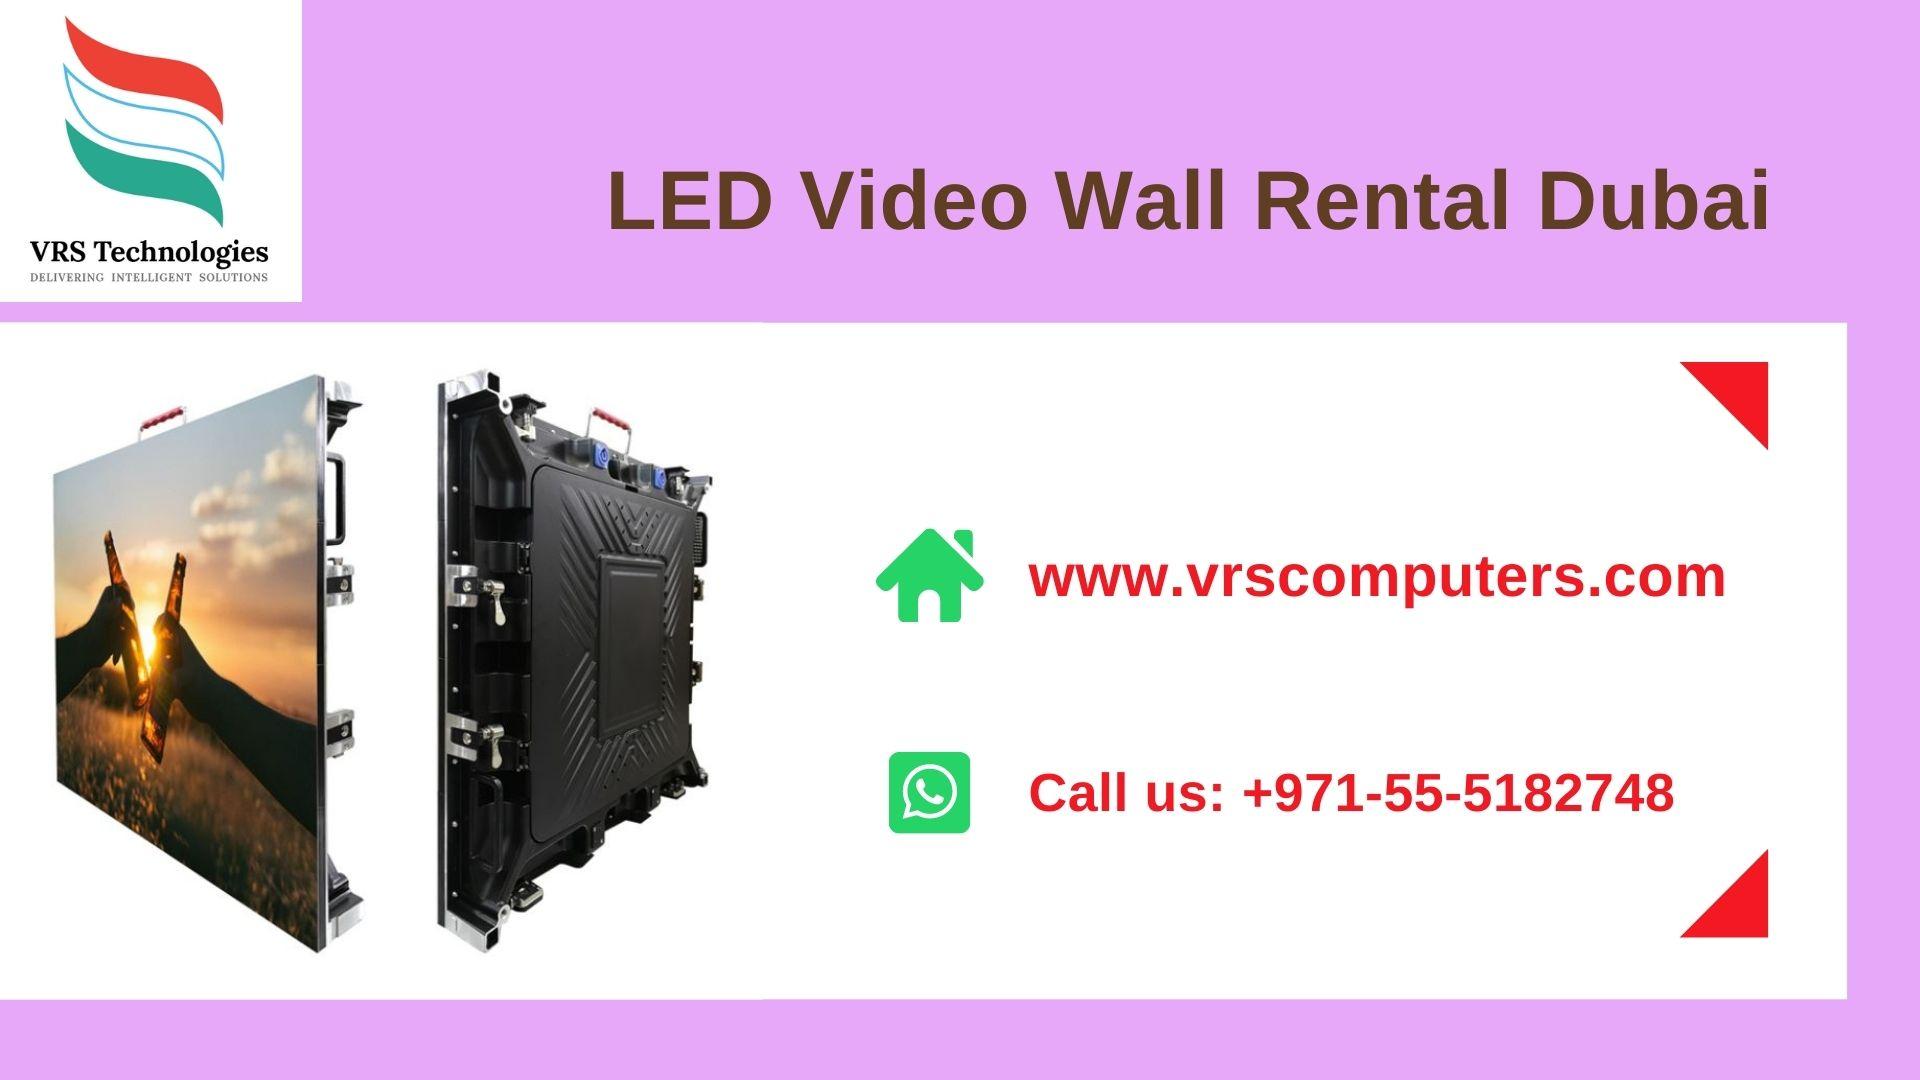 LED-Video-Wall-Rental-Dubai.jpg